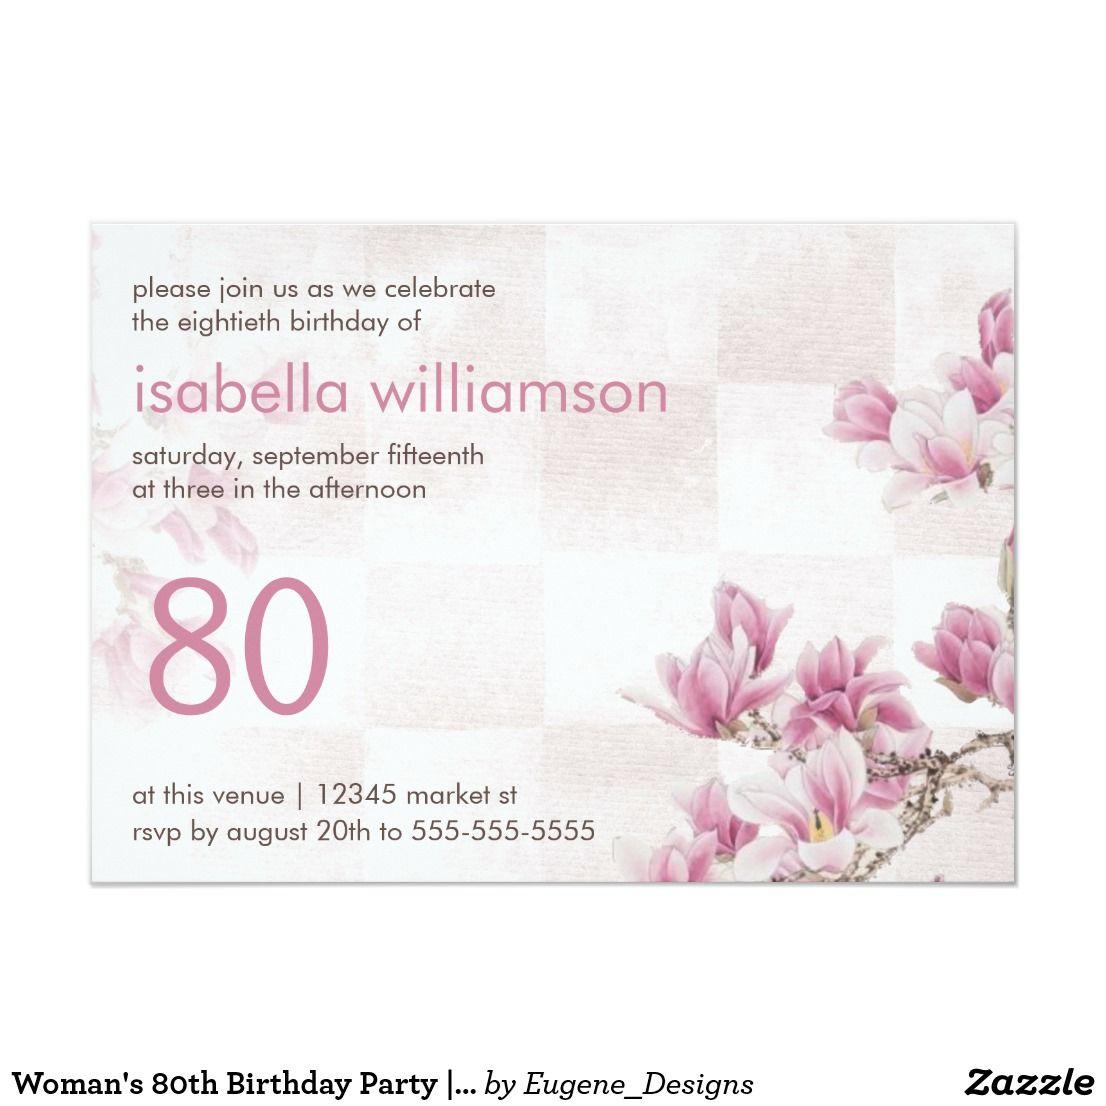 Woman's 80th Birthday Party Mauve Magnolias Invitation